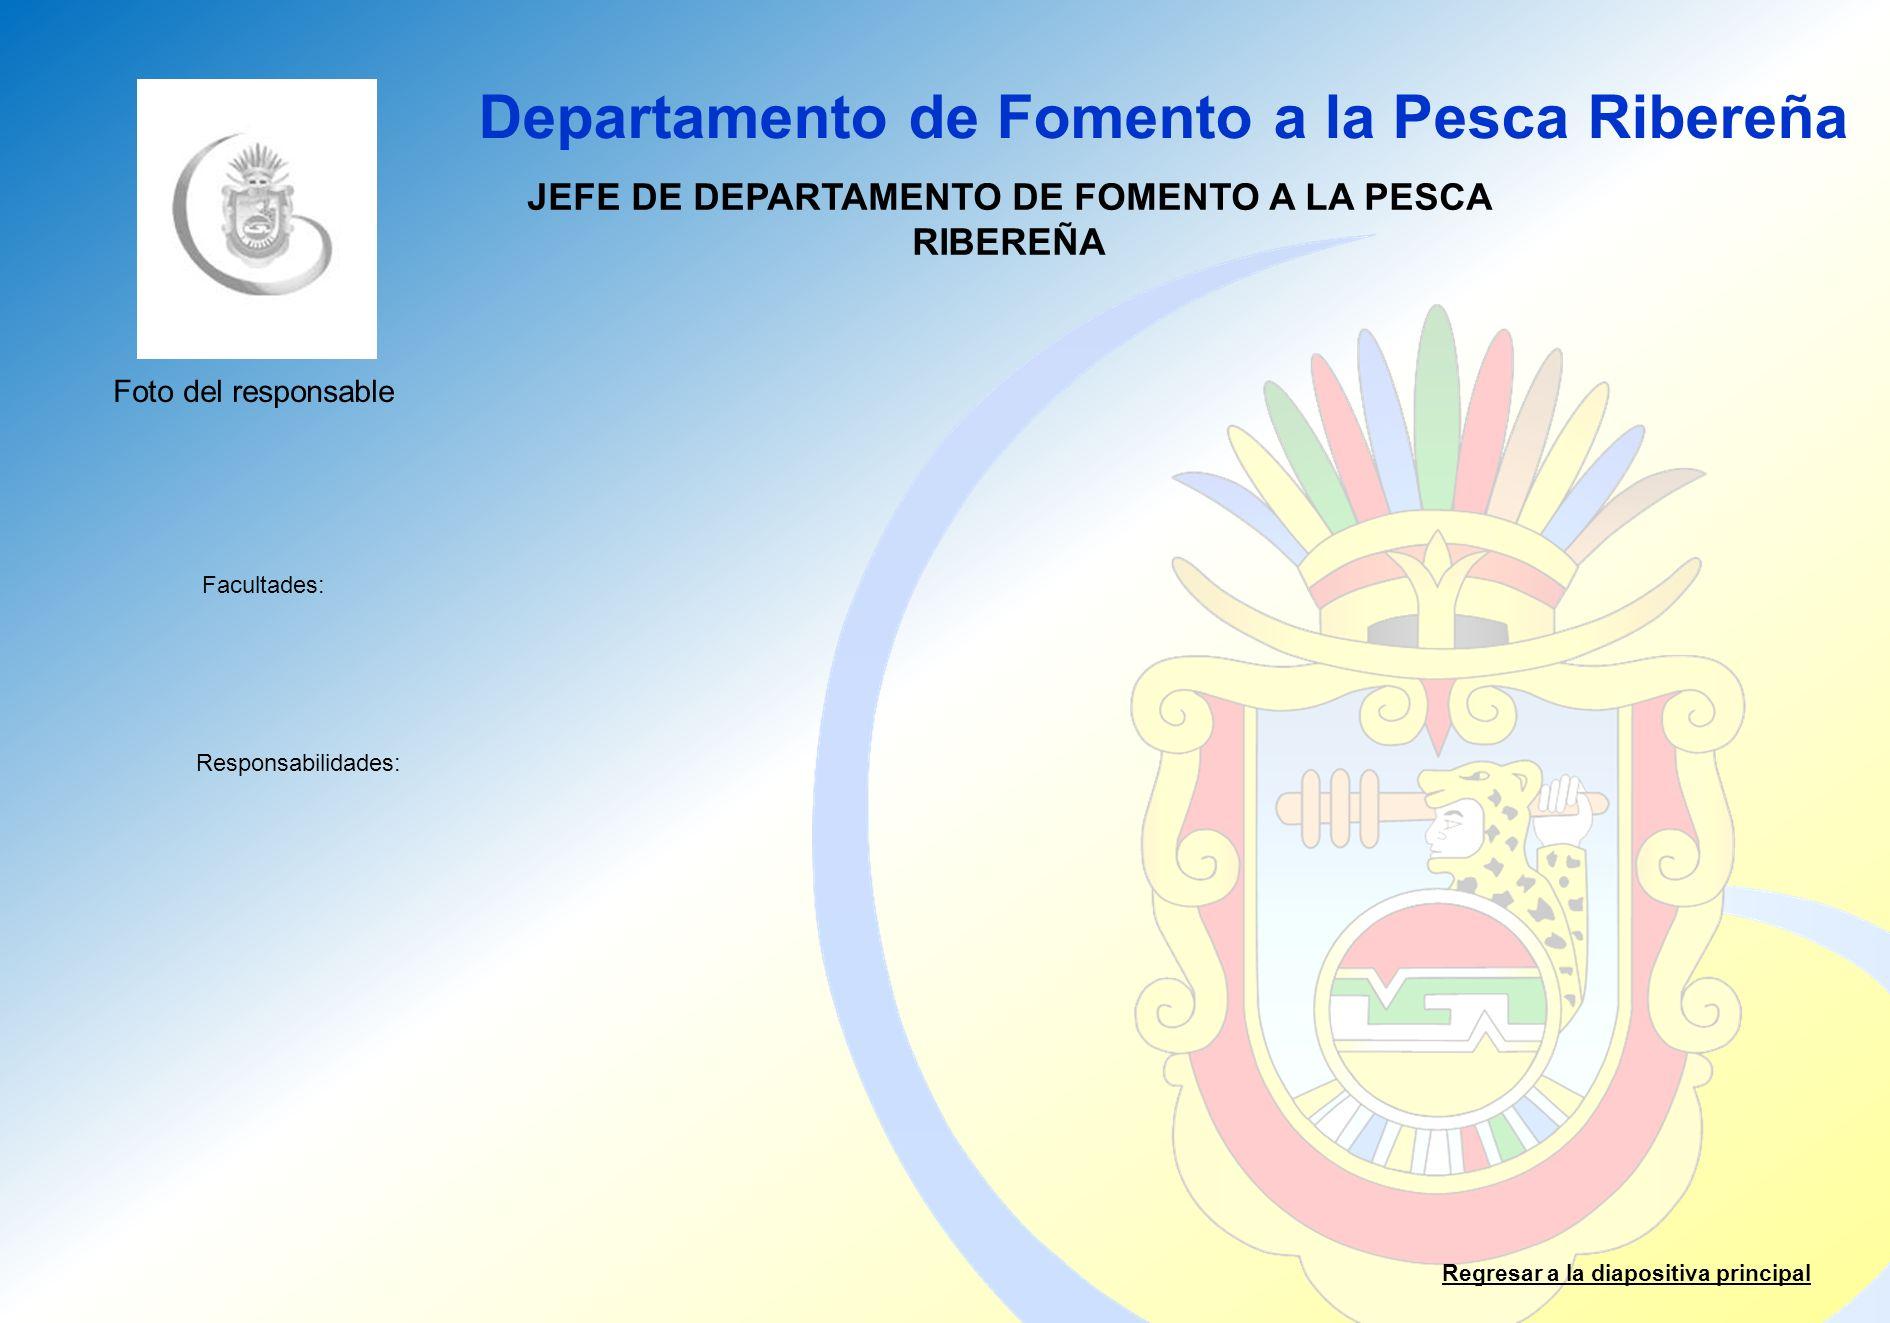 JEFE DE DEPARTAMENTO DE FOMENTO A LA PESCA RIBEREÑA